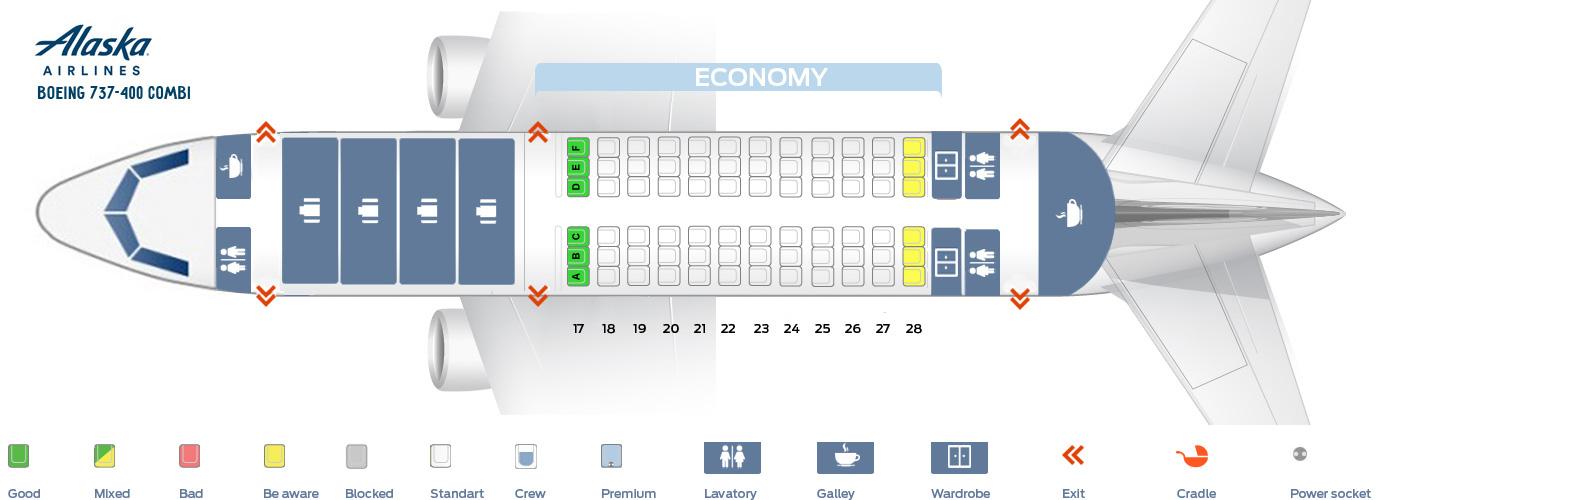 Seat map Boeing 737-400 Alaska Airlines. Version 2 Combi